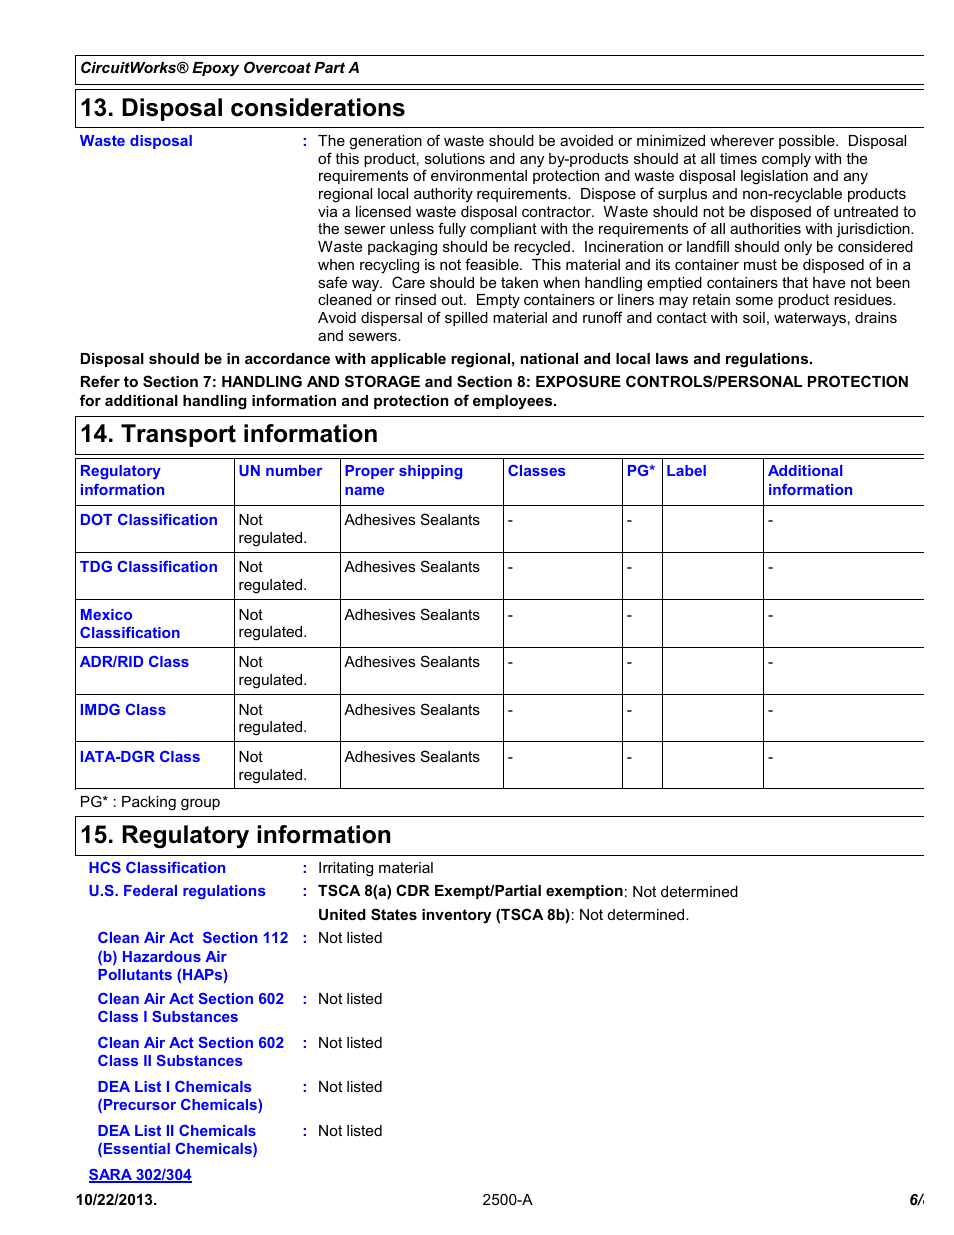 disposal considerations, transport information, regulatorydisposal considerations, transport information, regulatory information chemtronics circuitworks® epoxy overcoat (adhesive syringe) cw2500 user manual